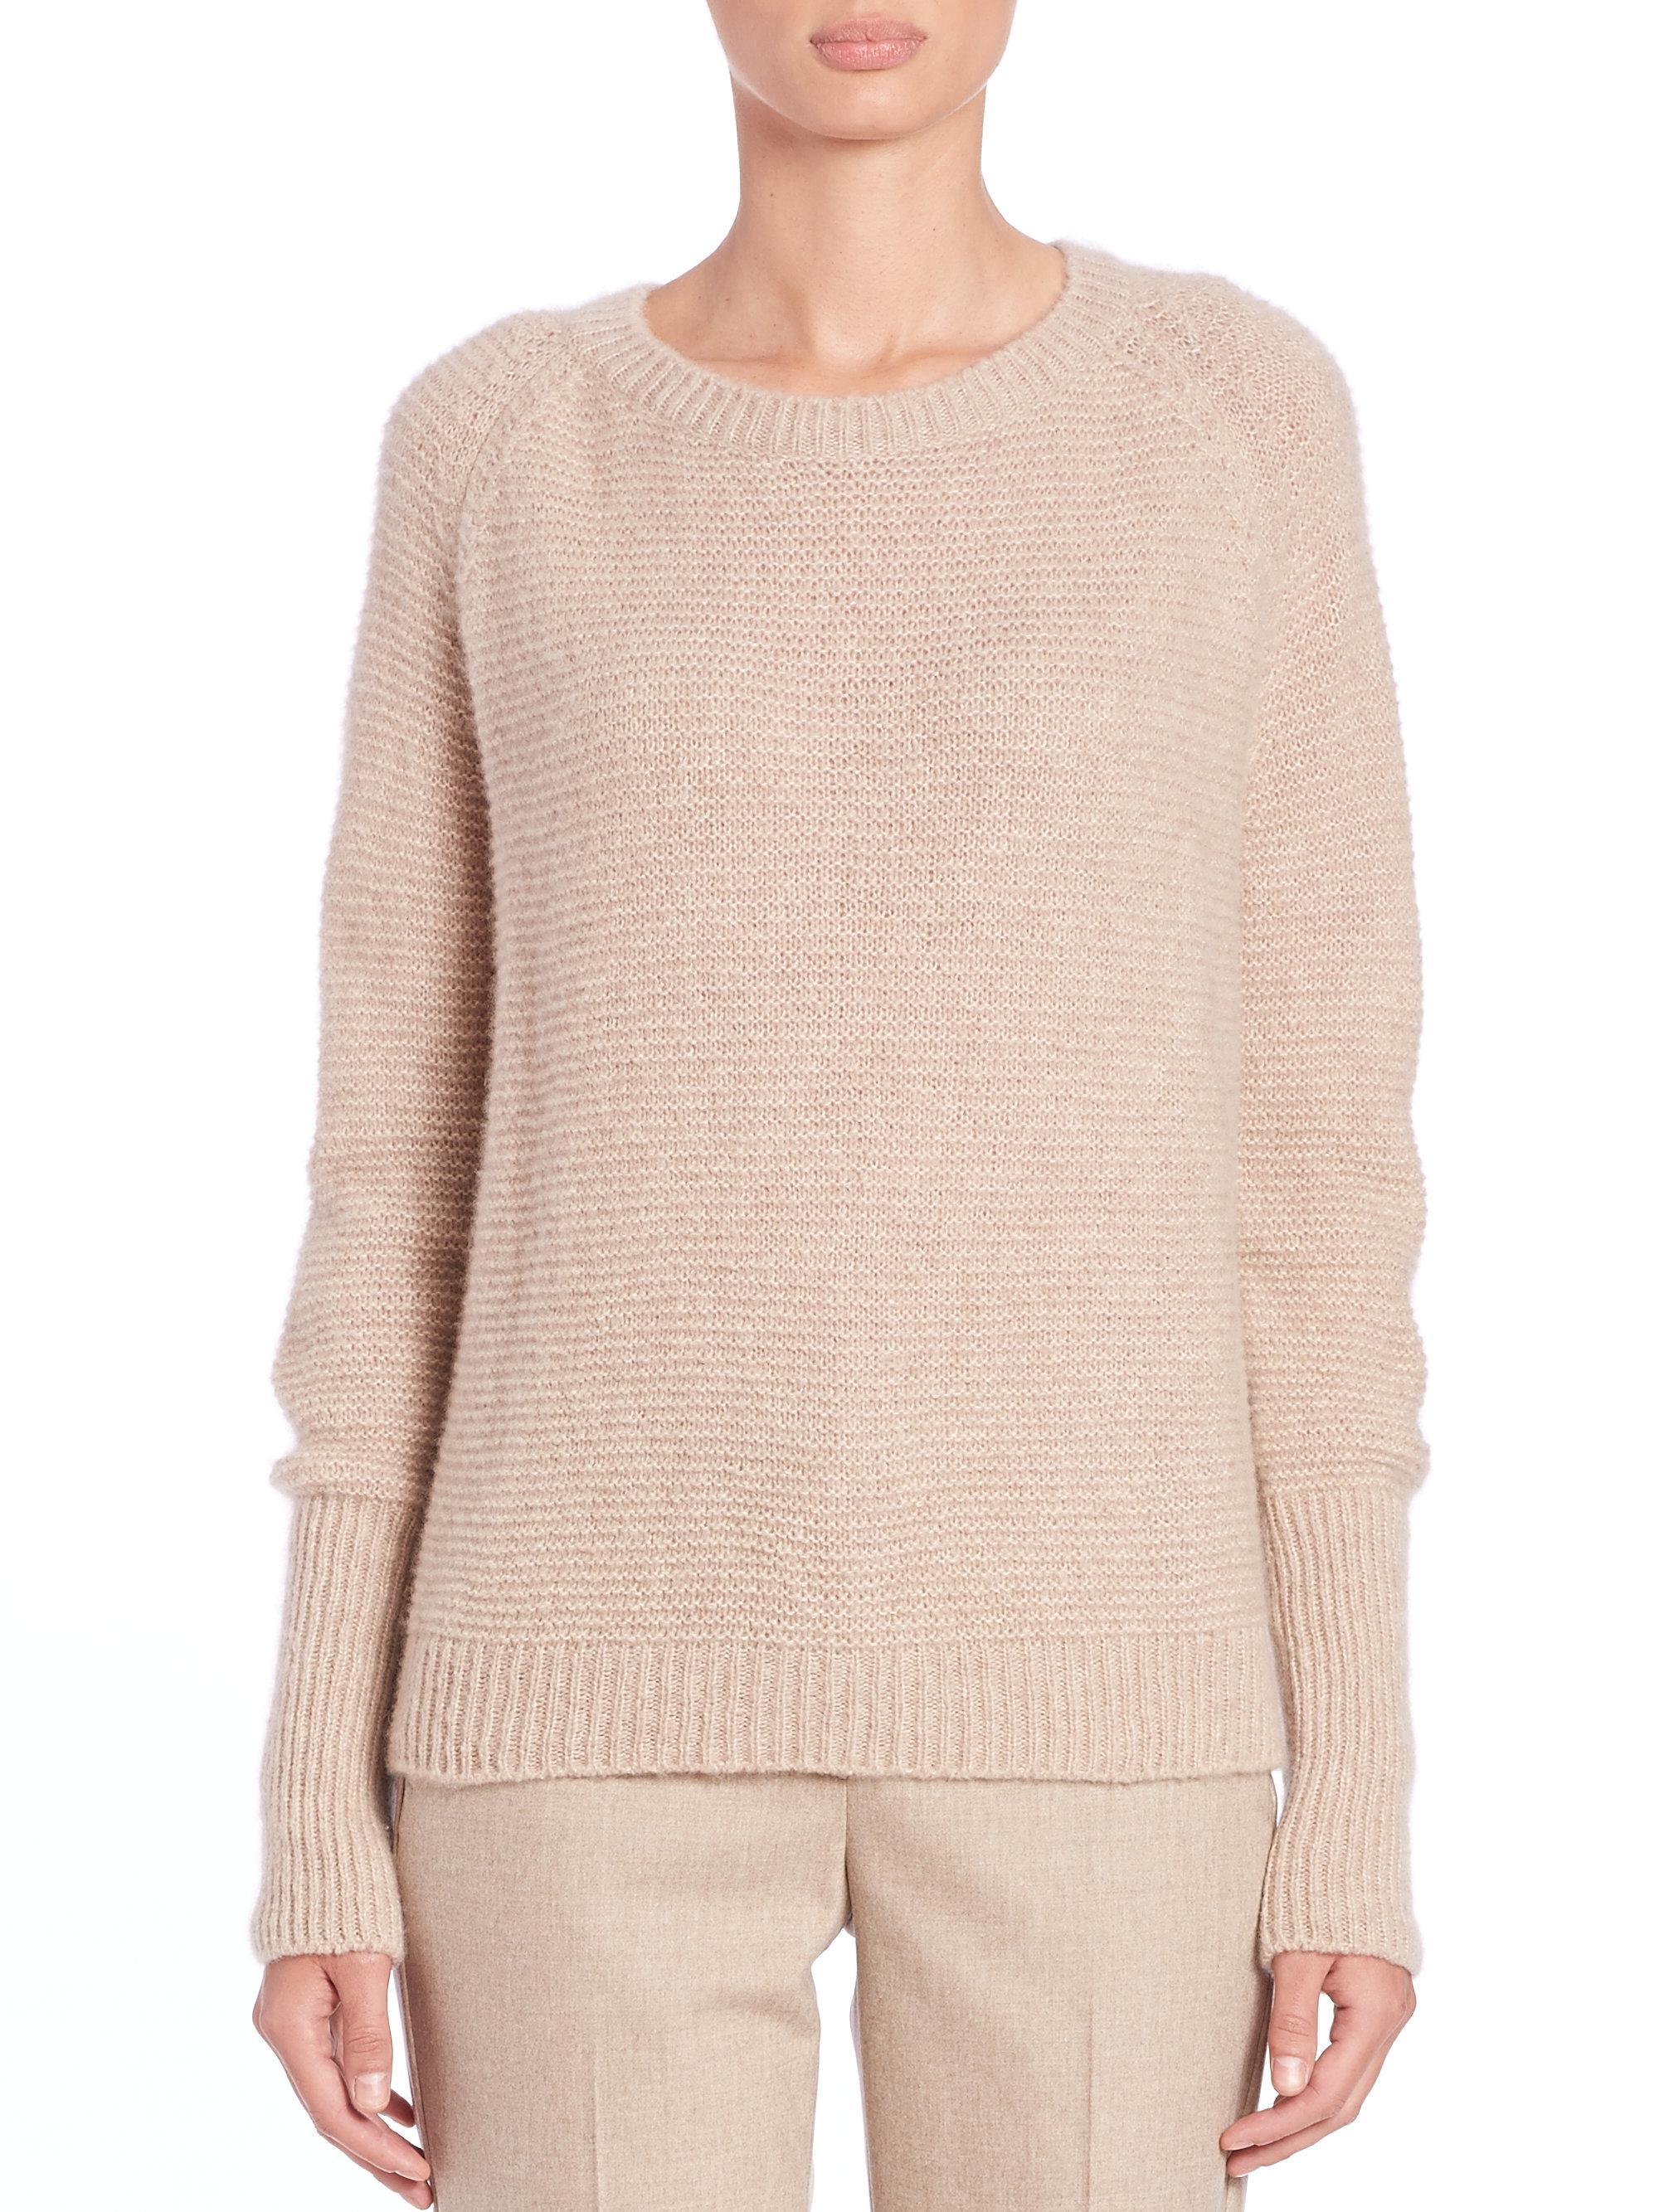 Max mara Brezza Silk-cashmere Sweater in Natural | Lyst